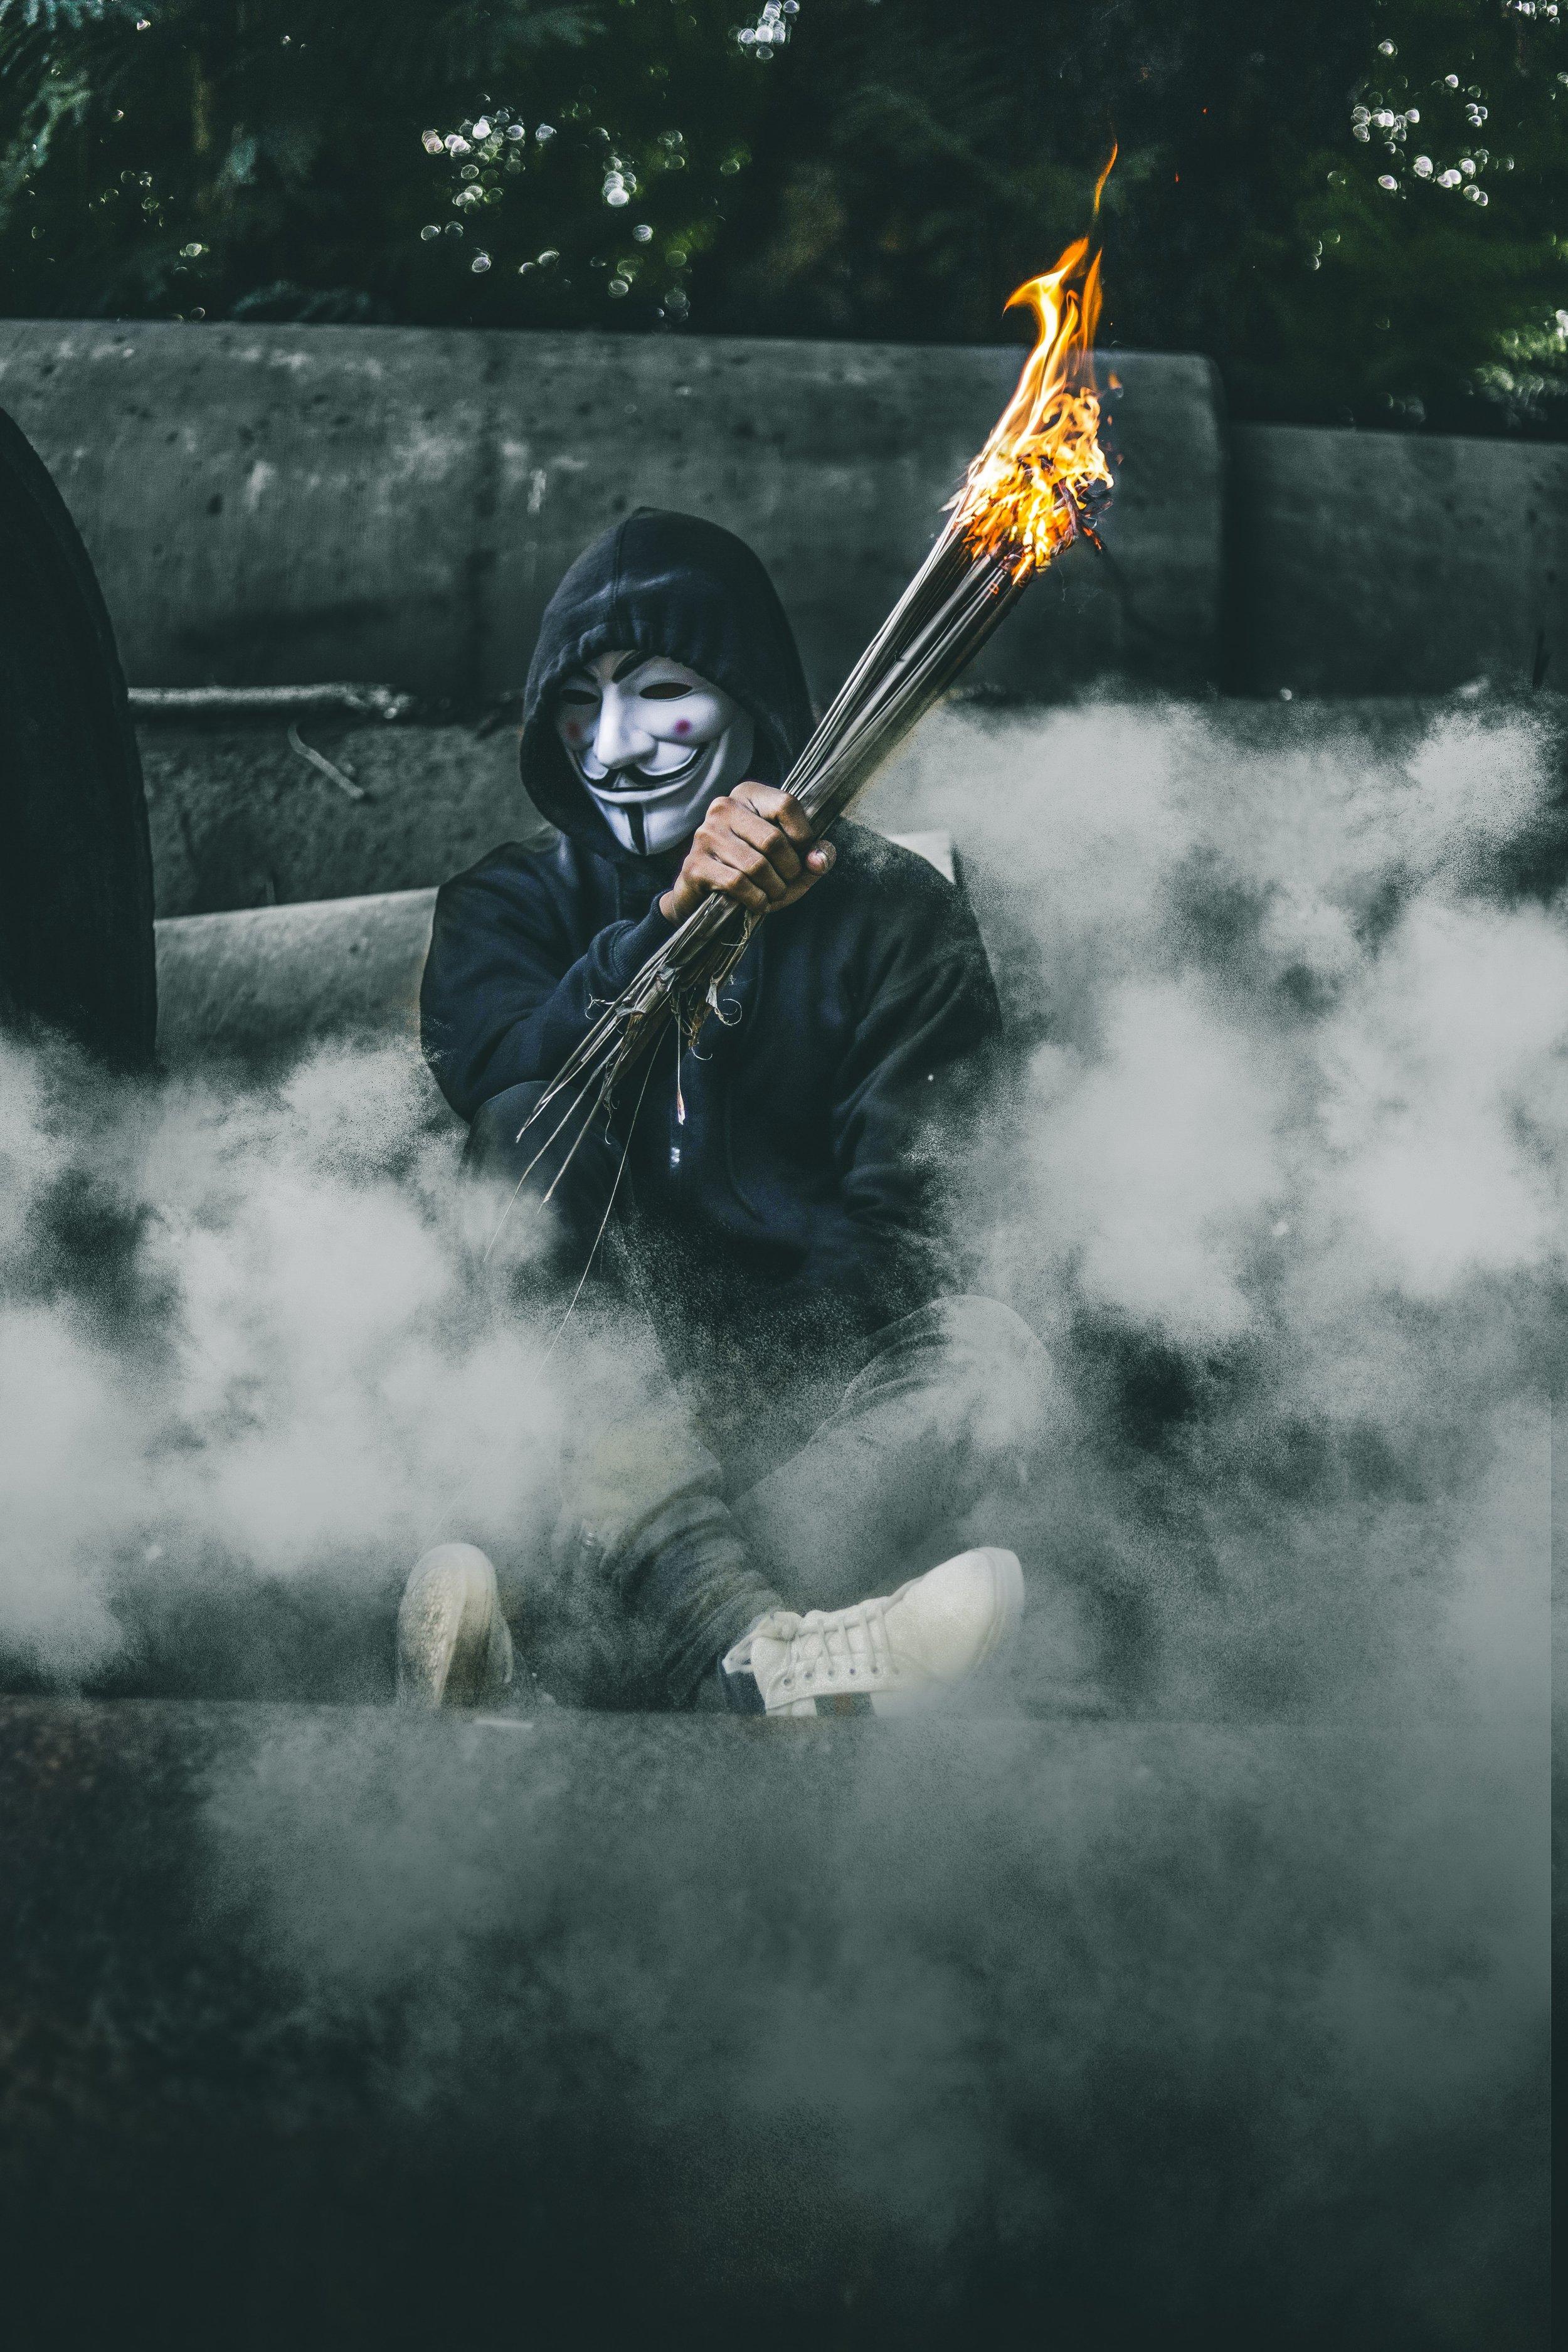 Photo by Ahmed Zayan on Unsplash